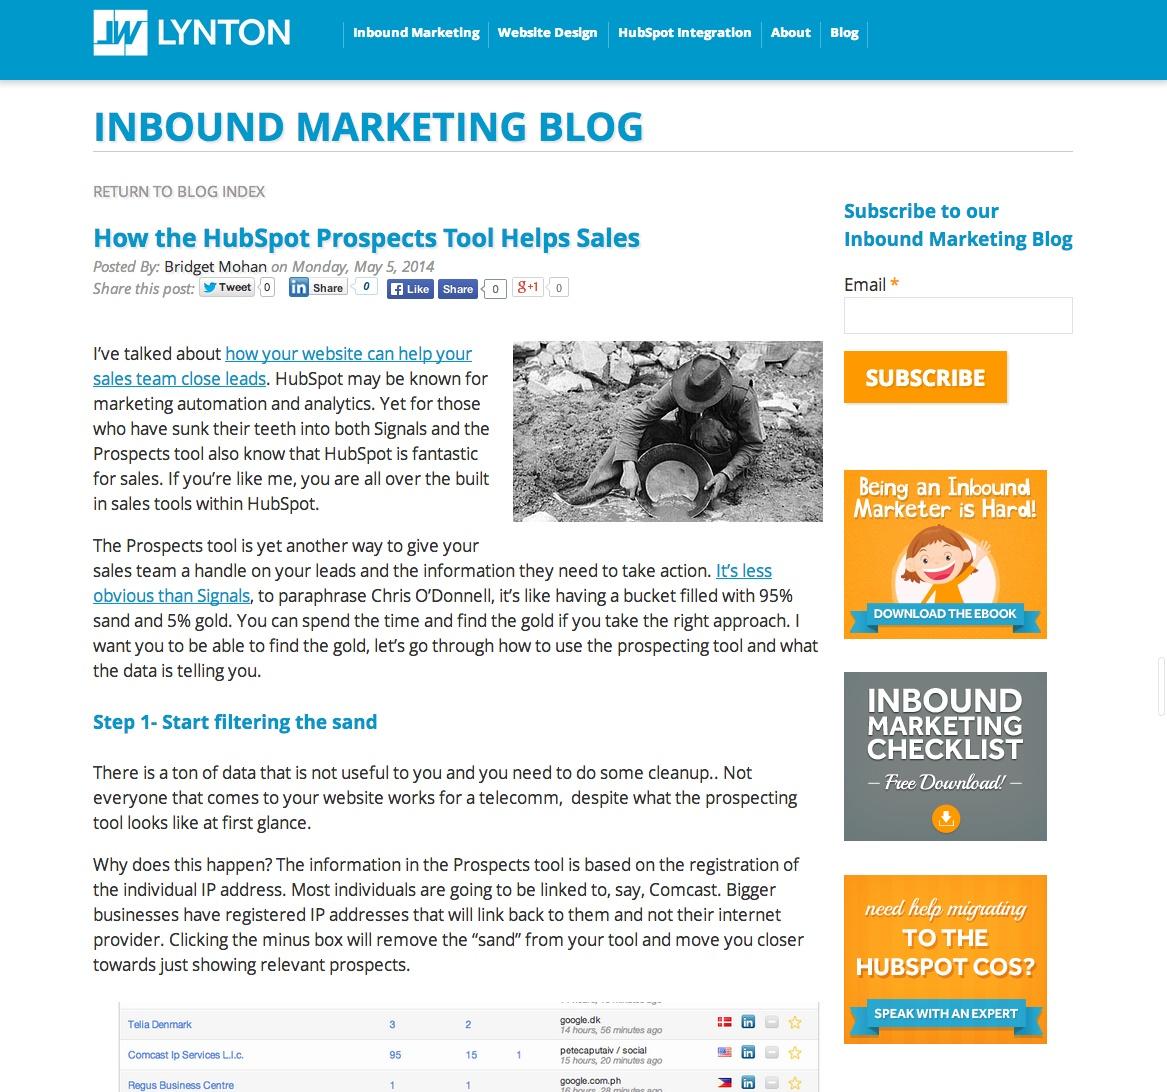 Mistakes on Your Inbound Marketing Blog